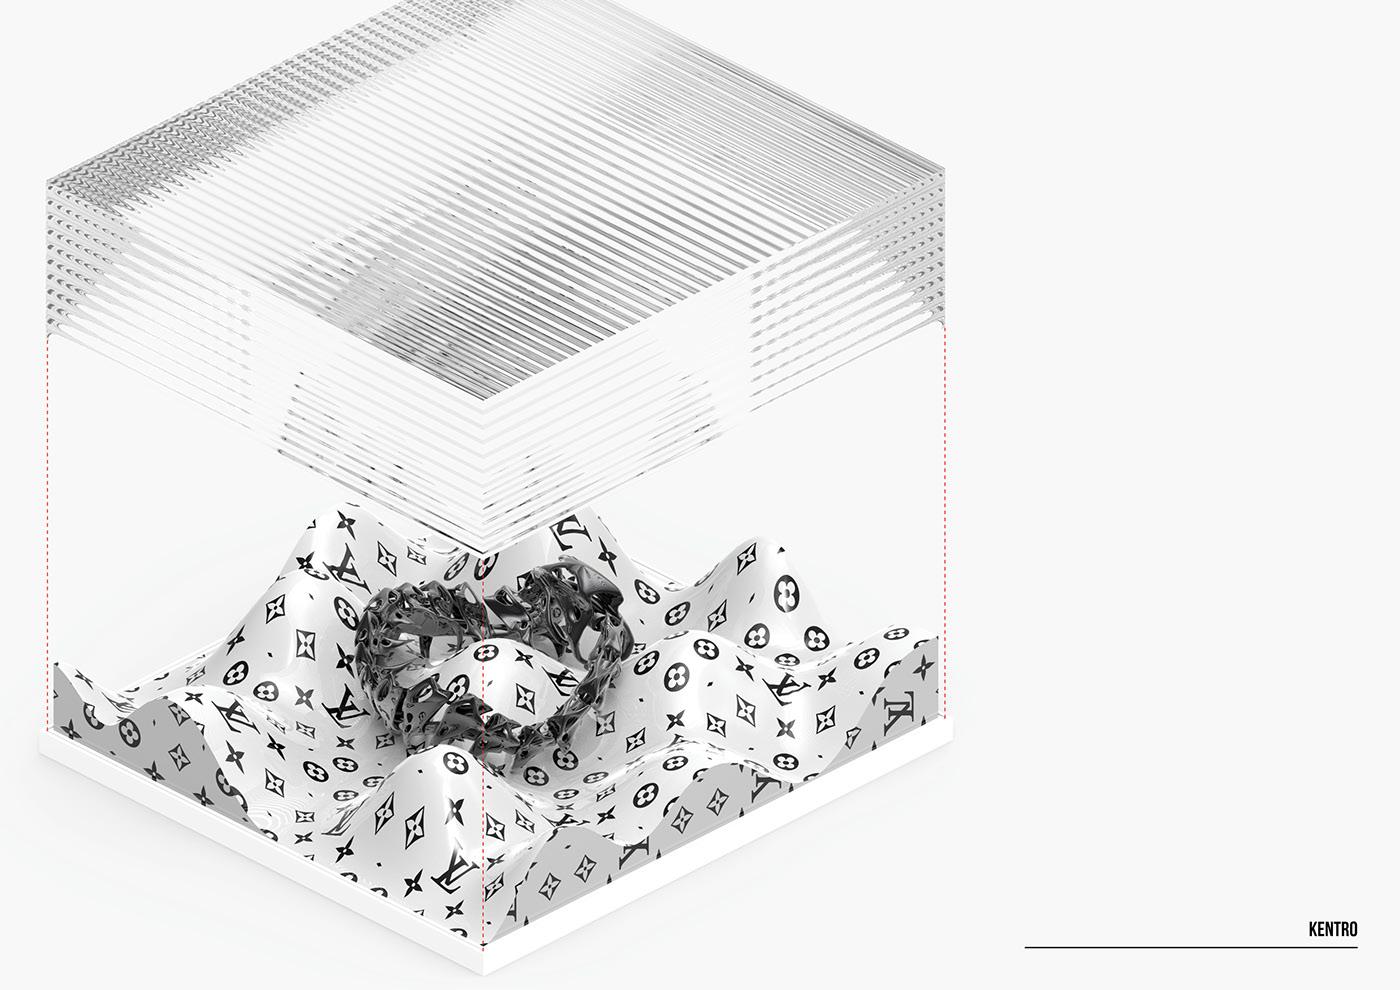 jewelry Jewellery LV Louis vuitton architecture 3D 3d print Fashion